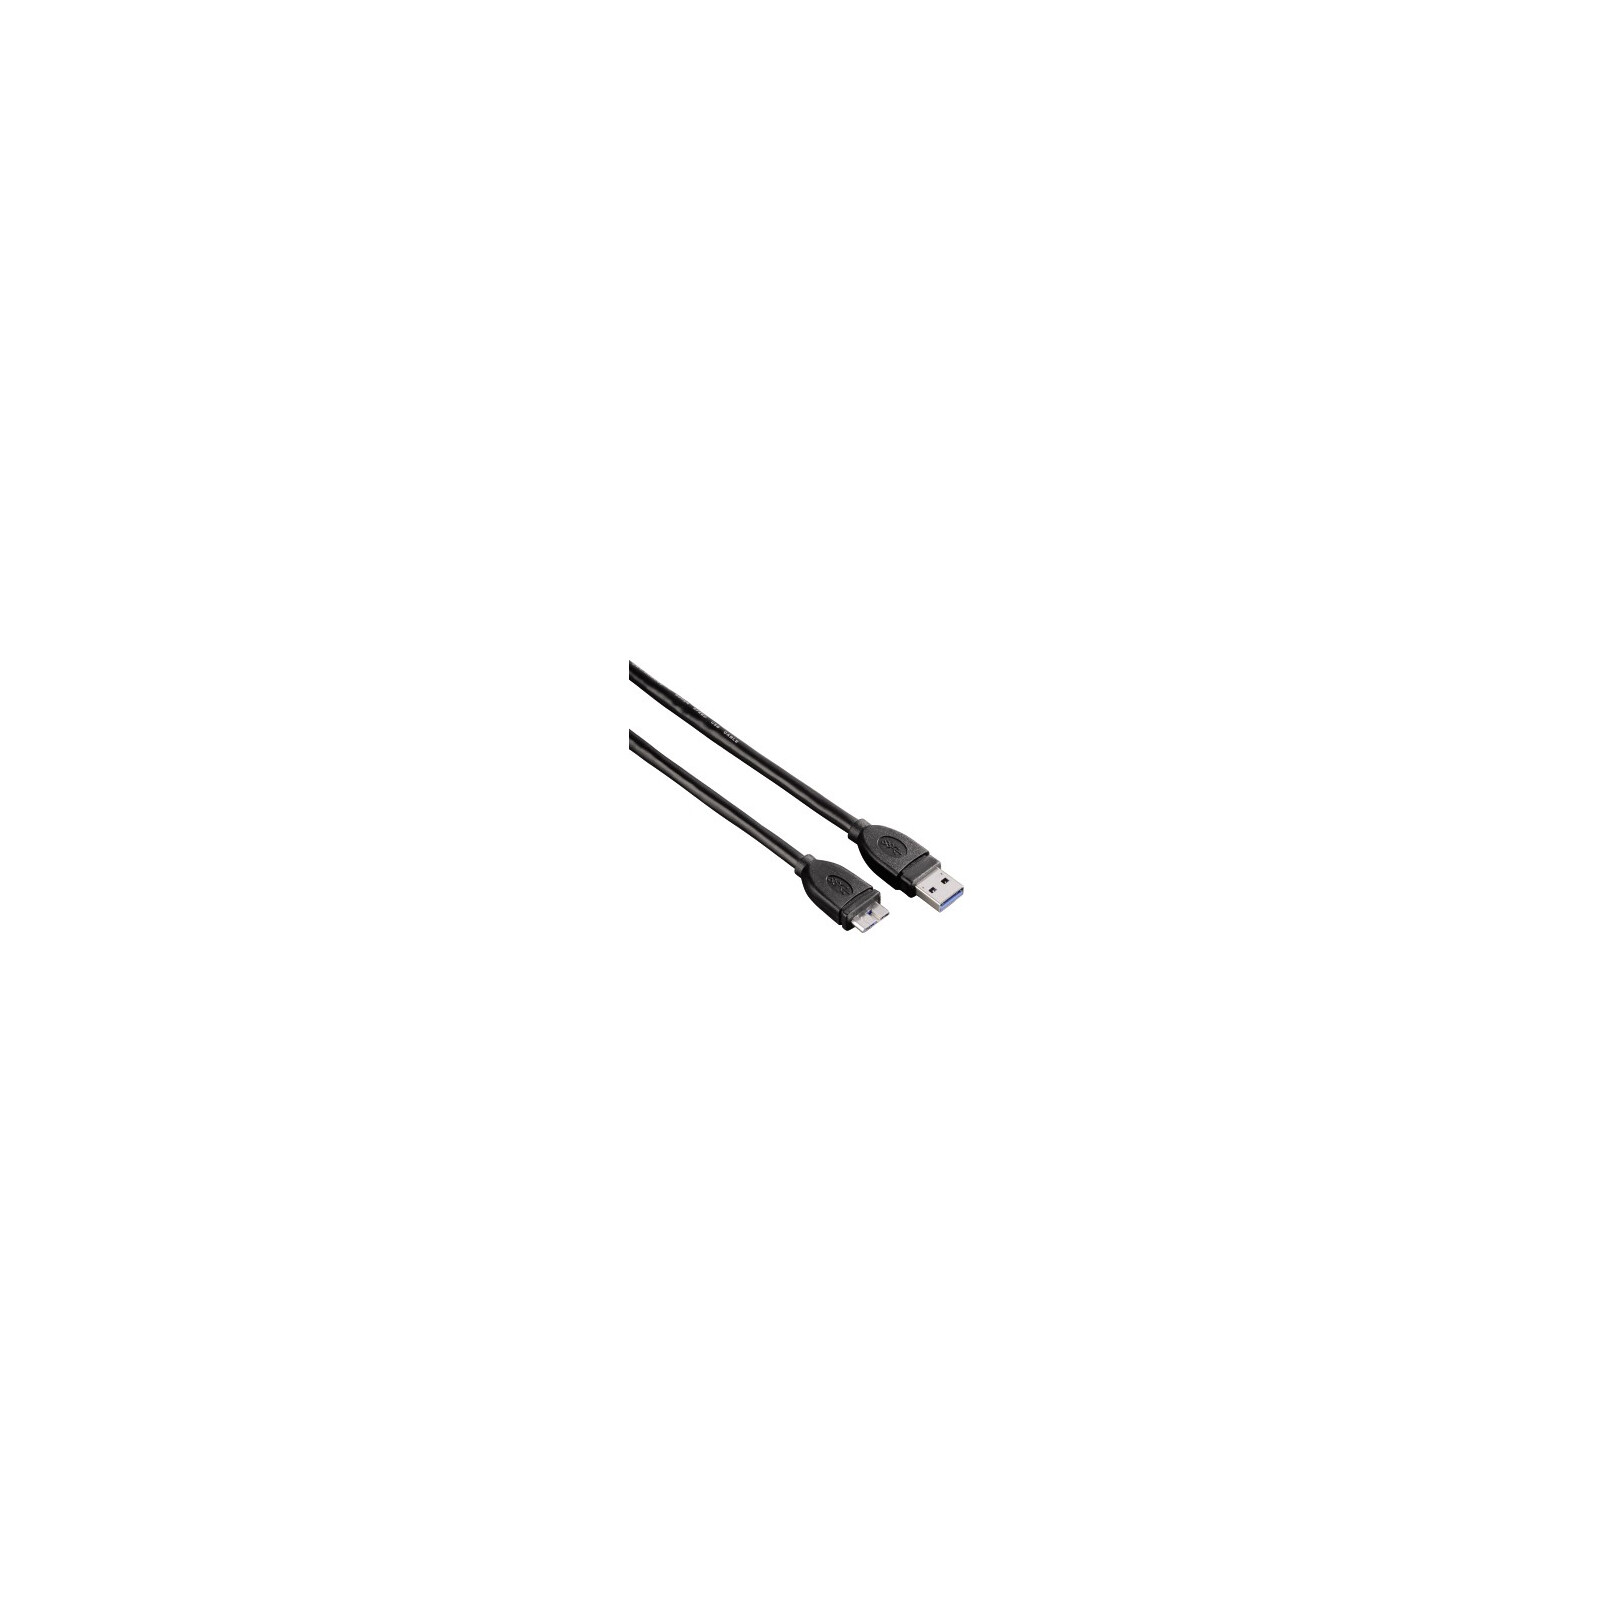 Hama 53749 Micro-USB-3.0-Kabel, geschirmt, 0,75 m